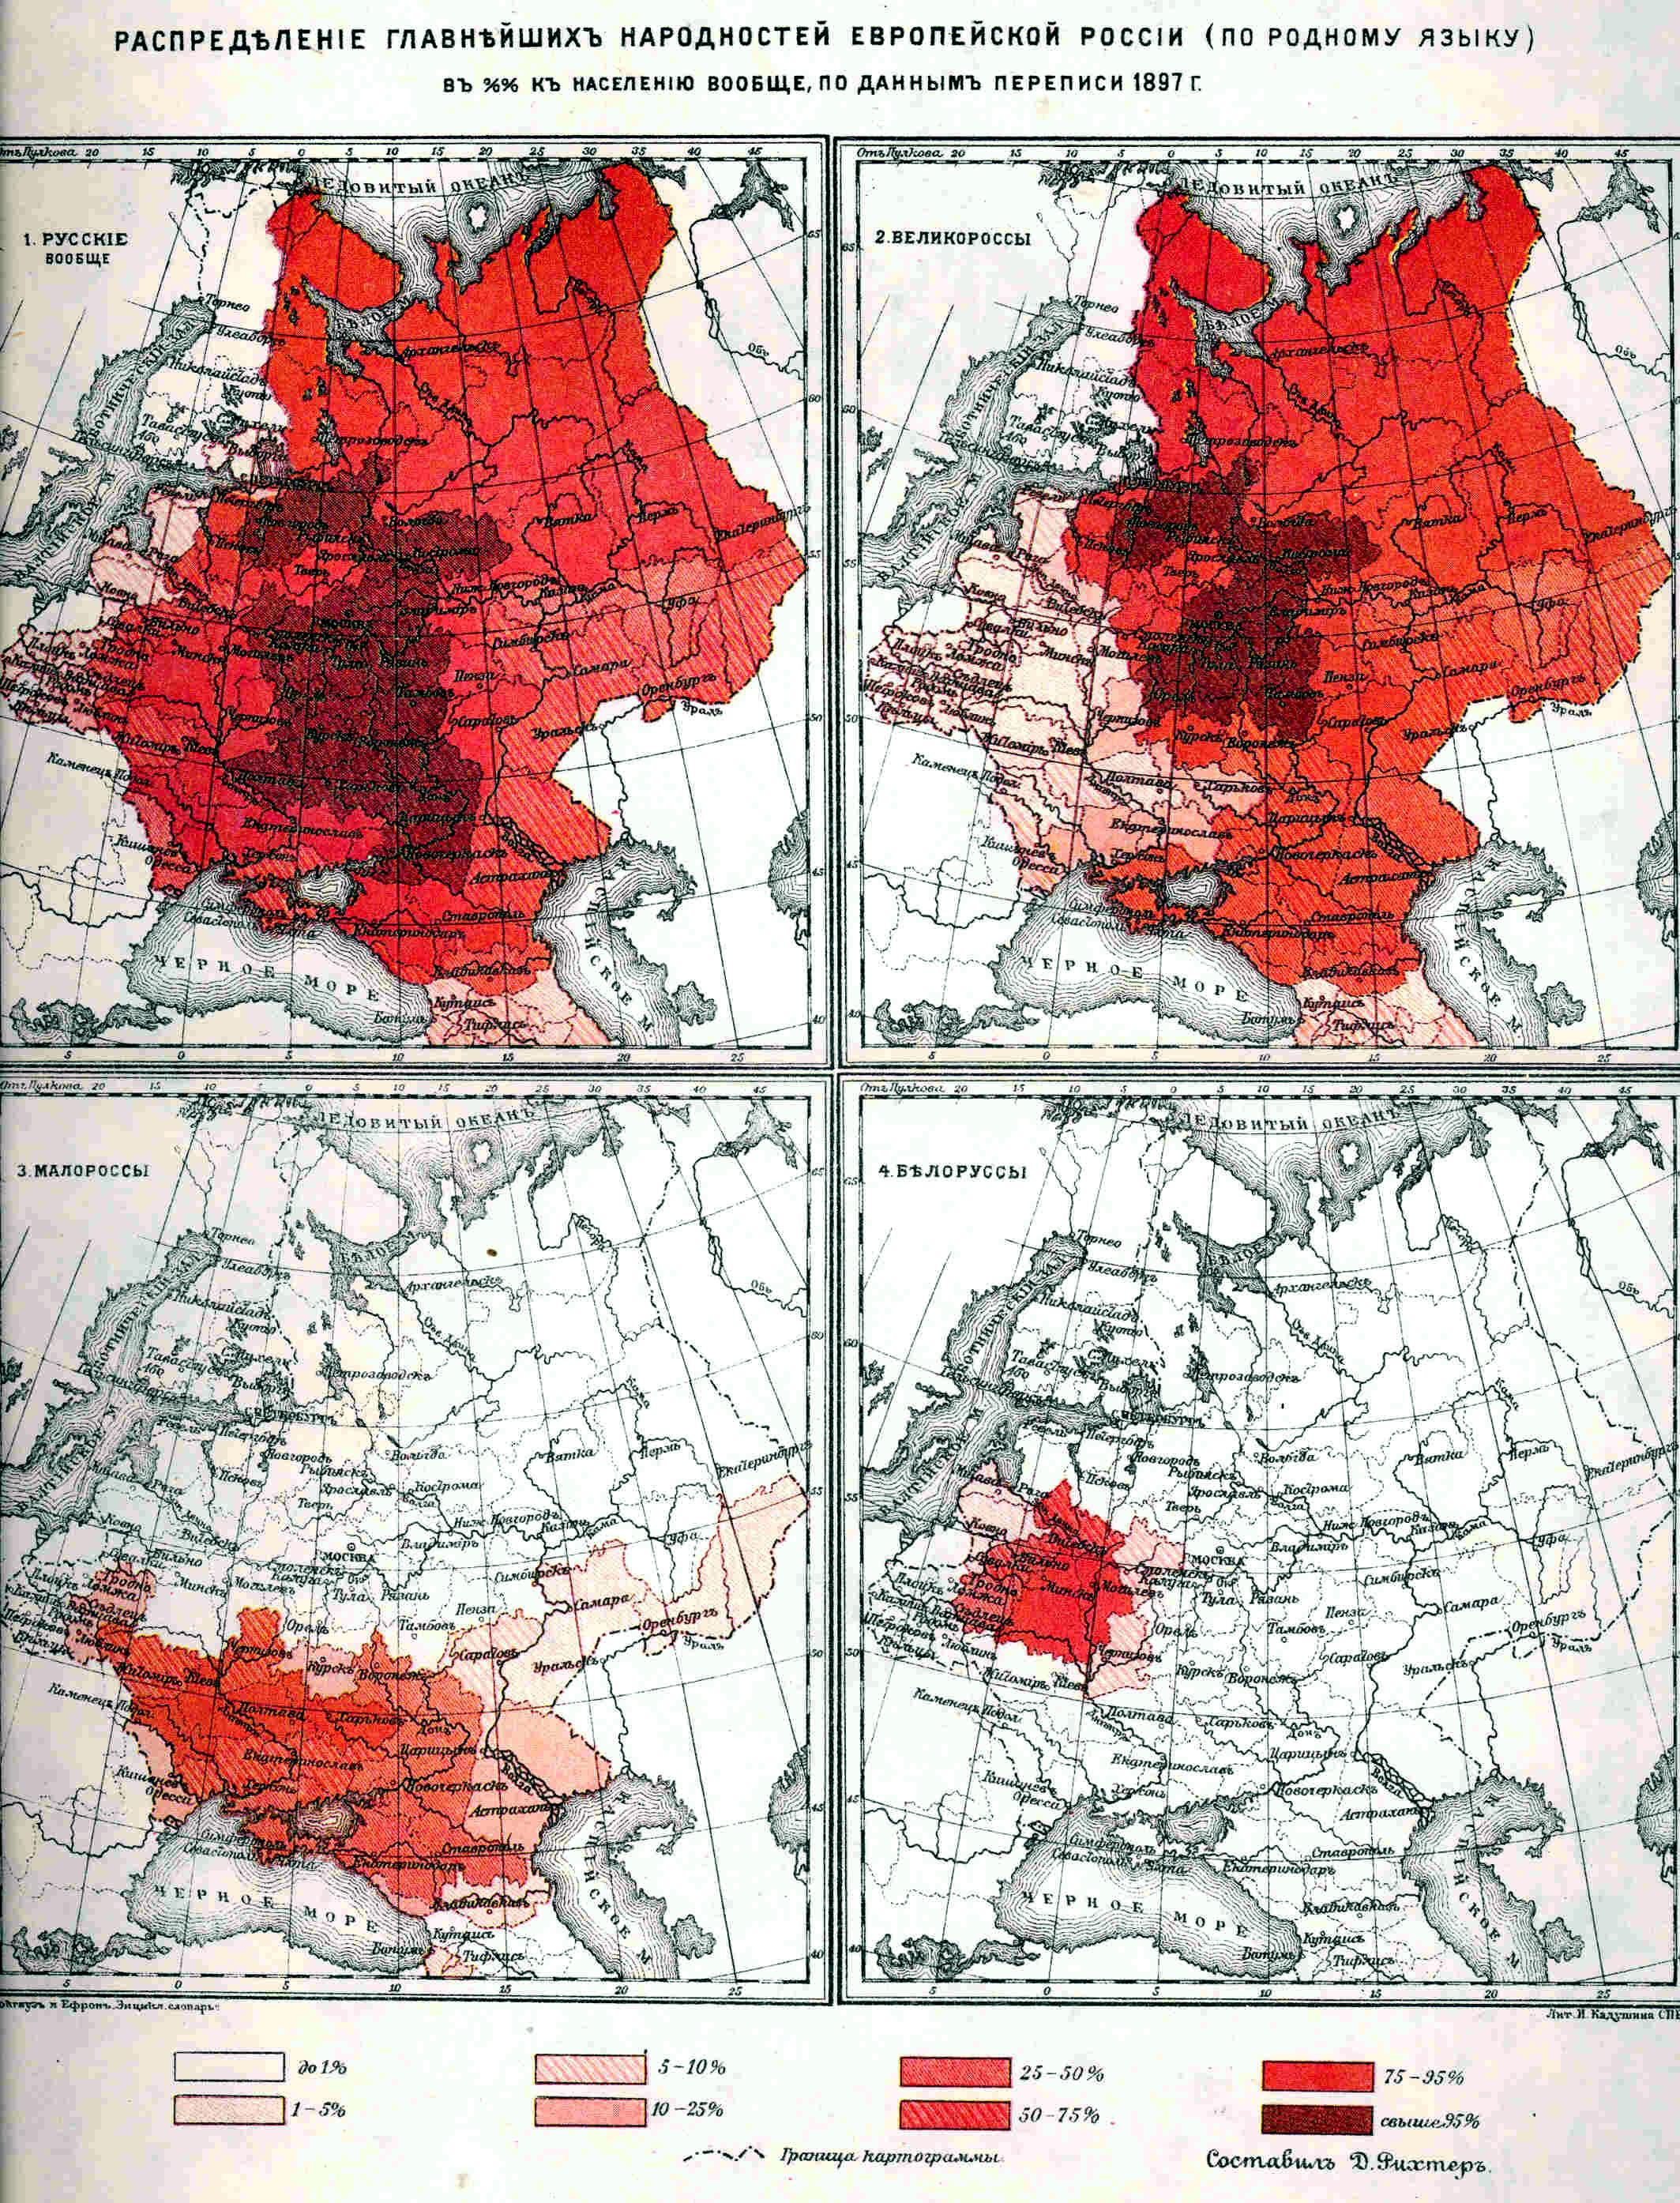 Ethnic_distribution_census-1897